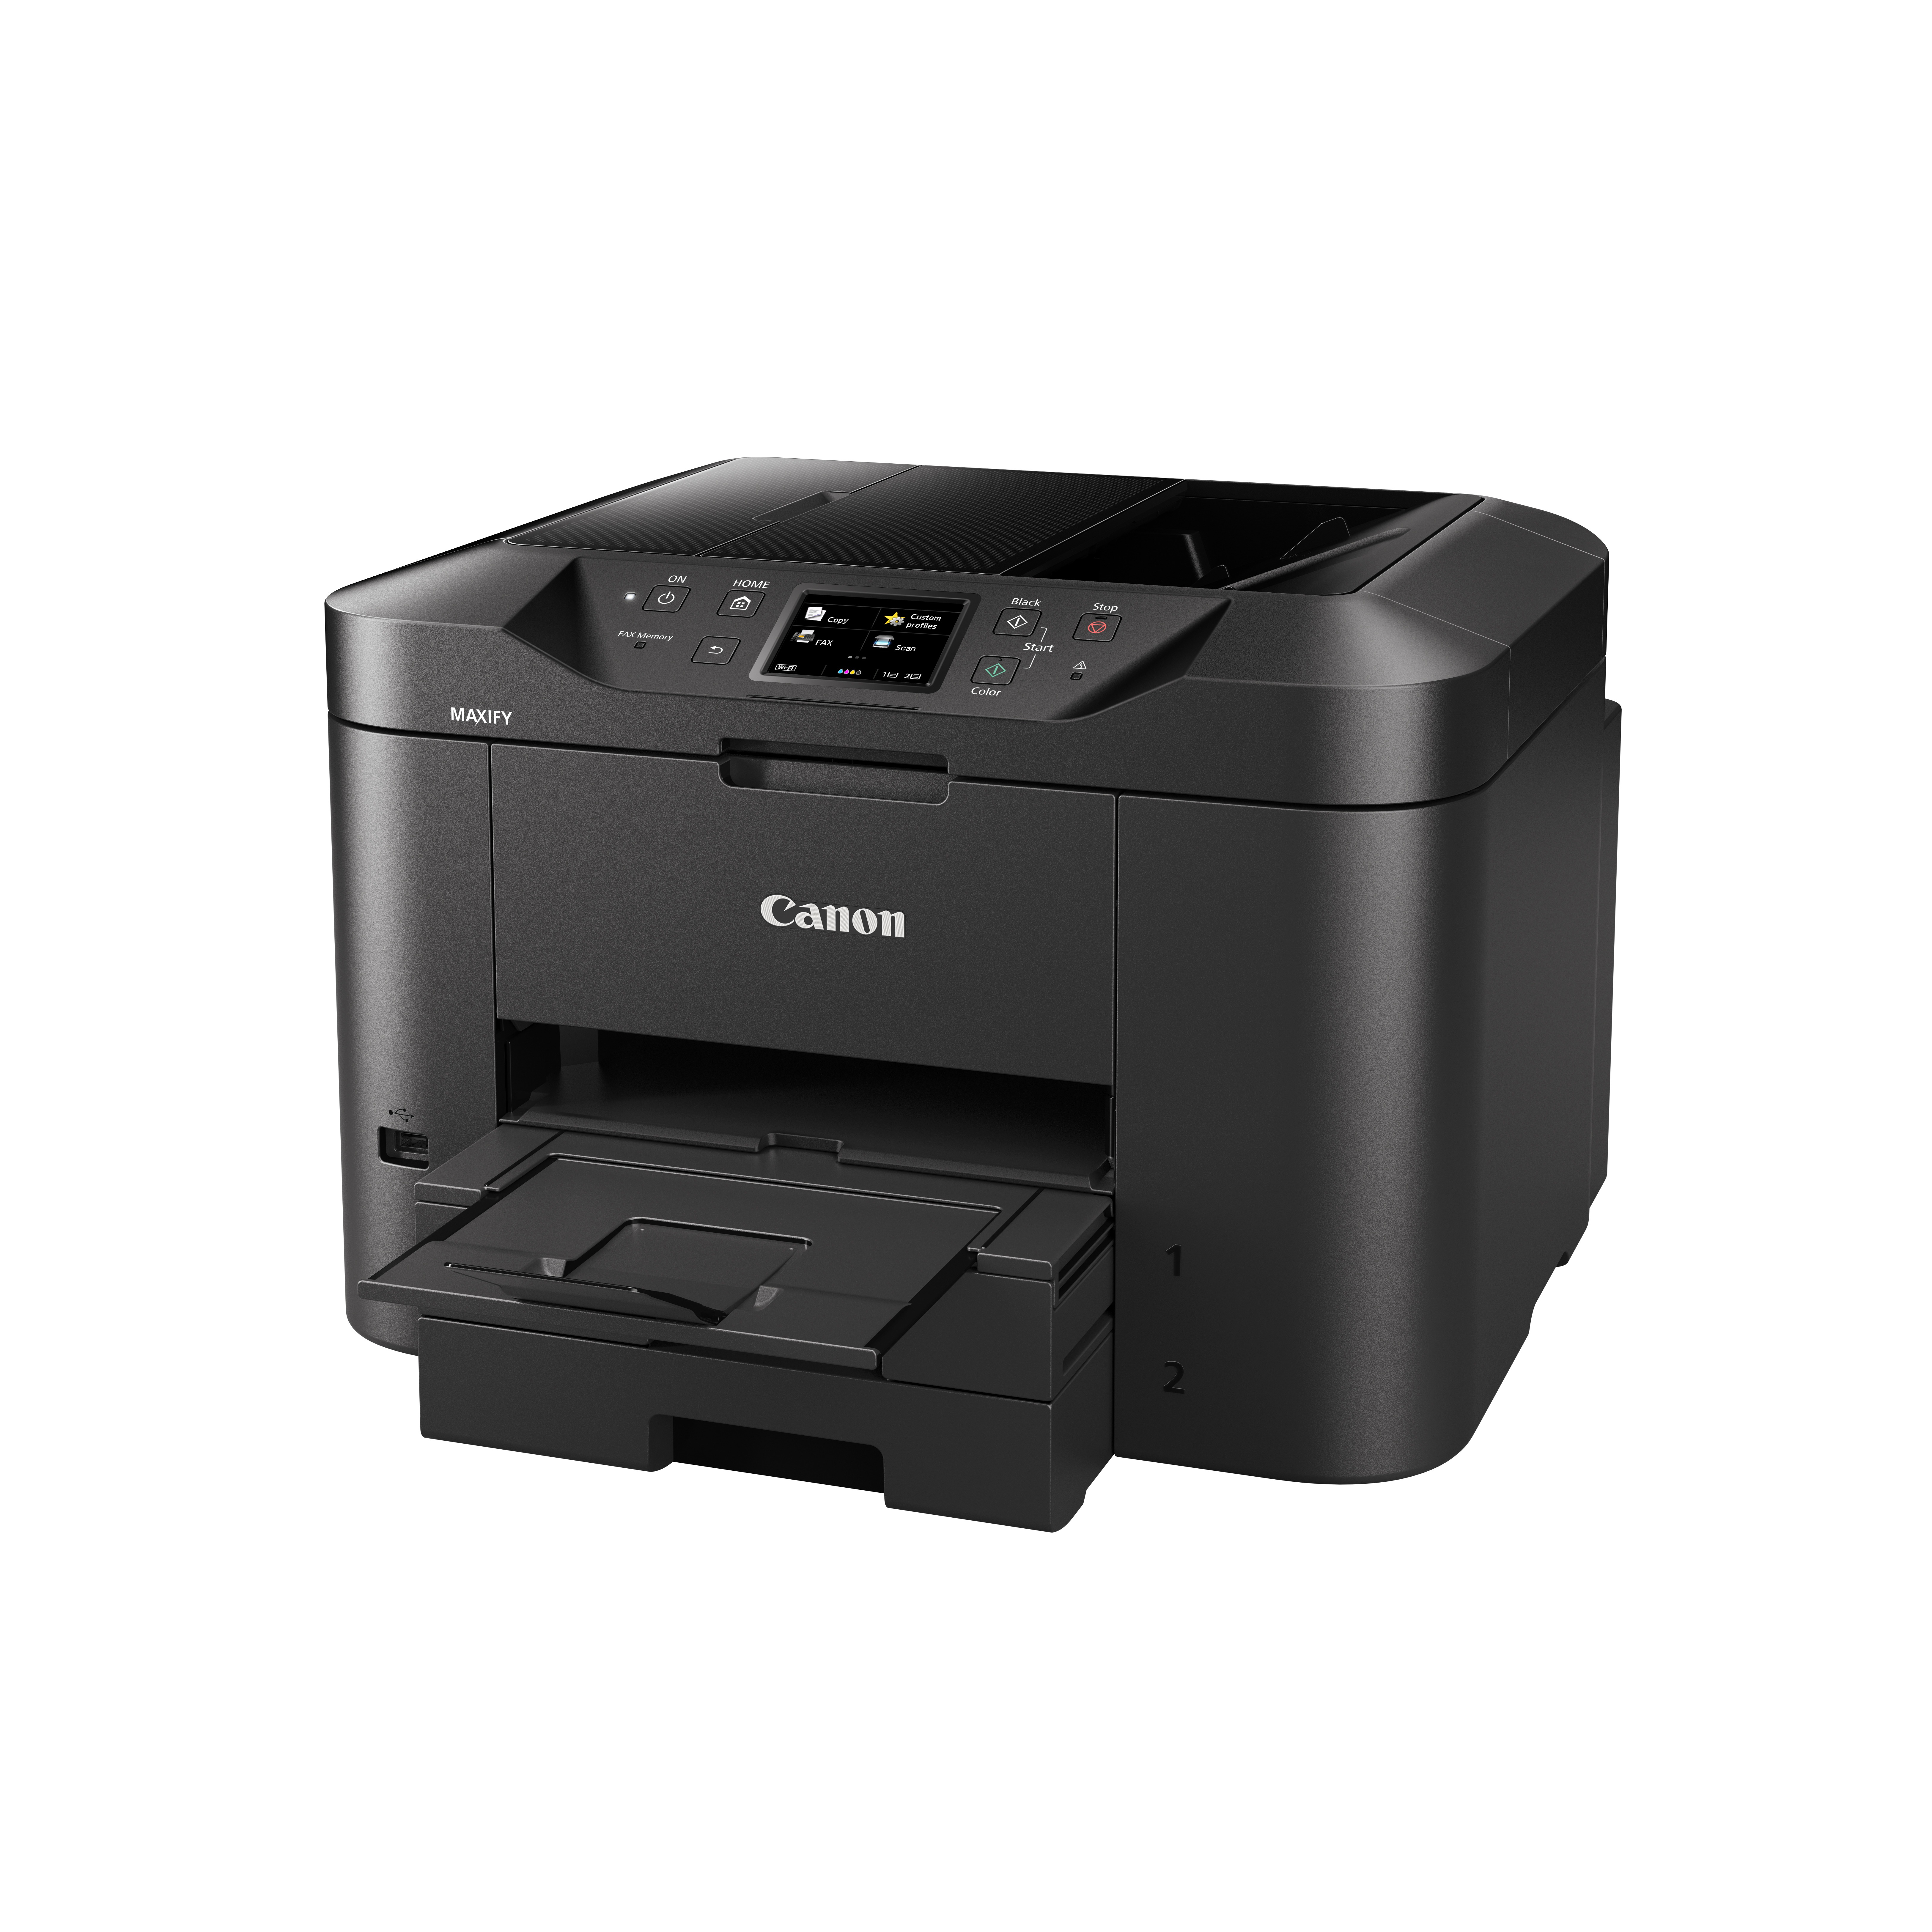 Maxify MB2750 Multifunction printer (A4, 24 ipm, 500 vellen, USB 2.0, LAN, Wi-Fi)